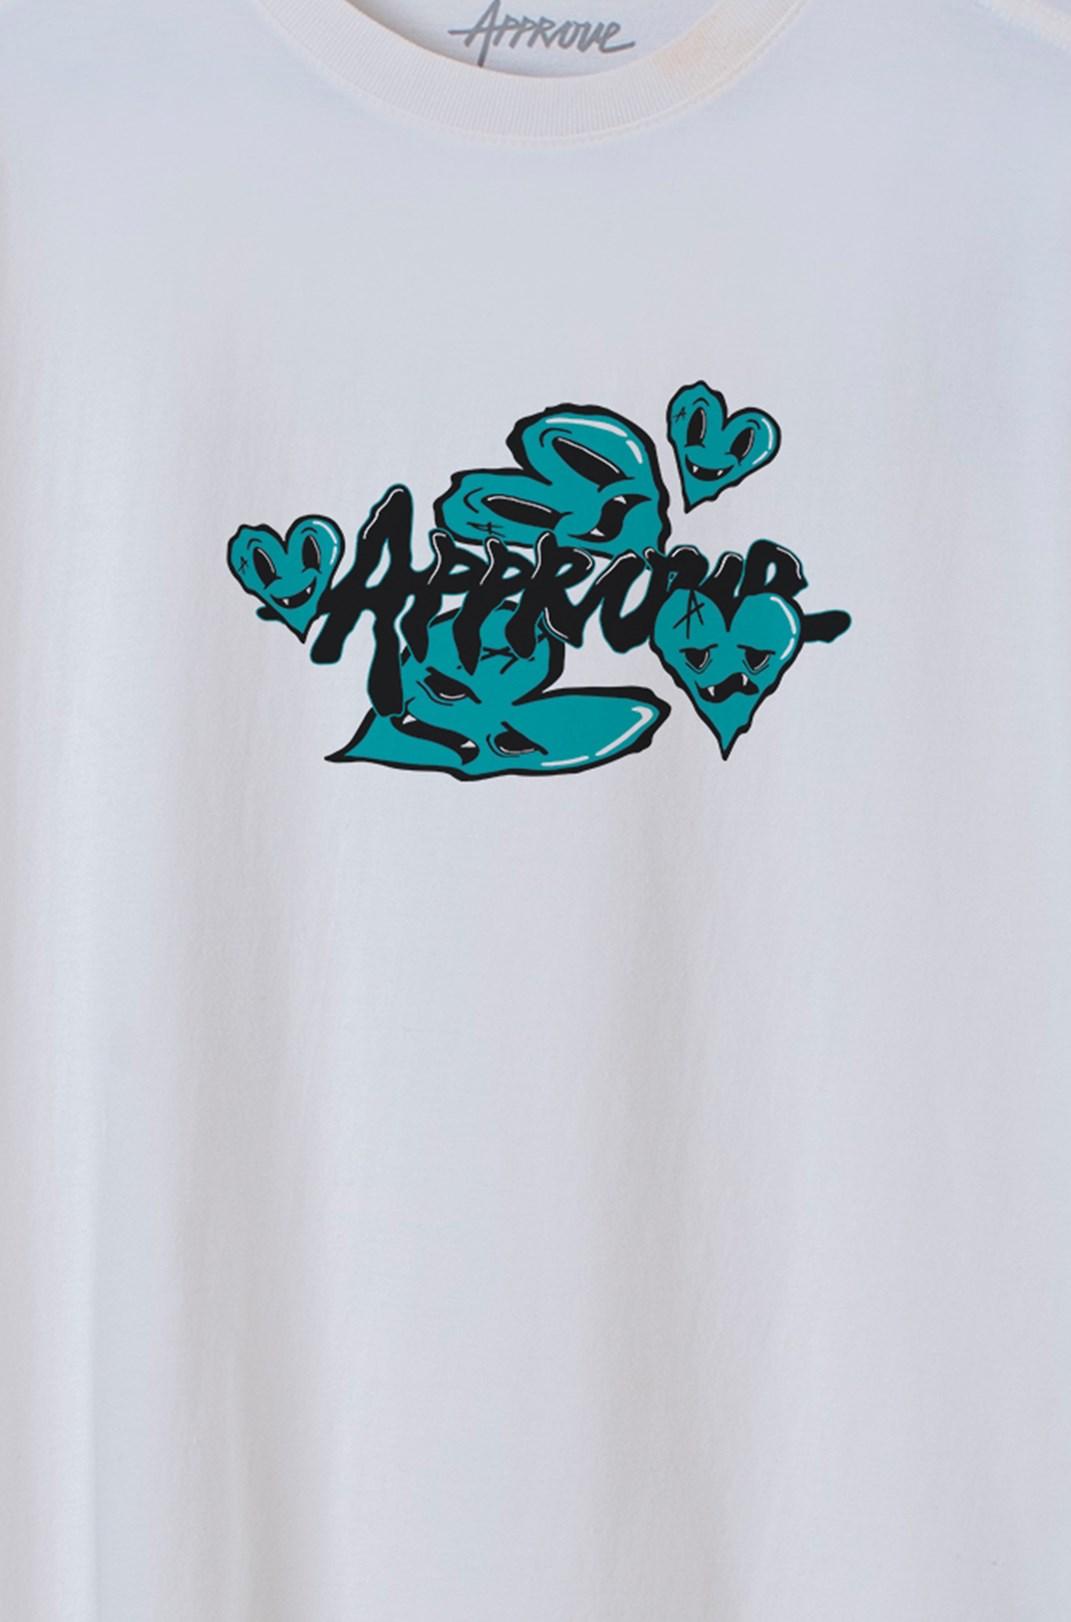 Camiseta Bold Approve Fantastic World Heart Off White